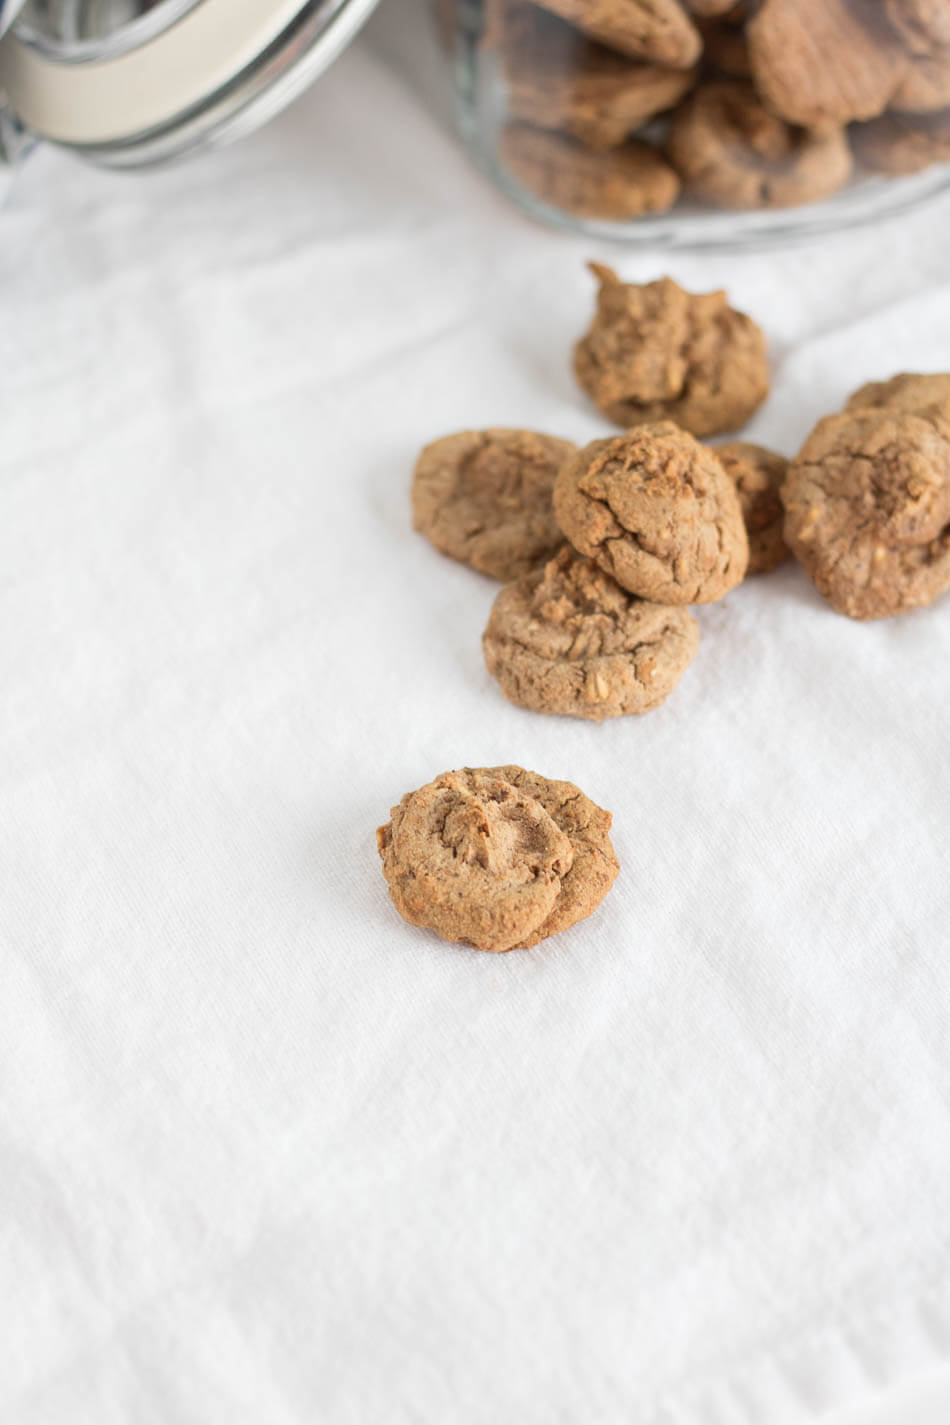 Maple Oat Puppy Treats | www.infinebalance.com #recipe #dog #doggie #dogtreats